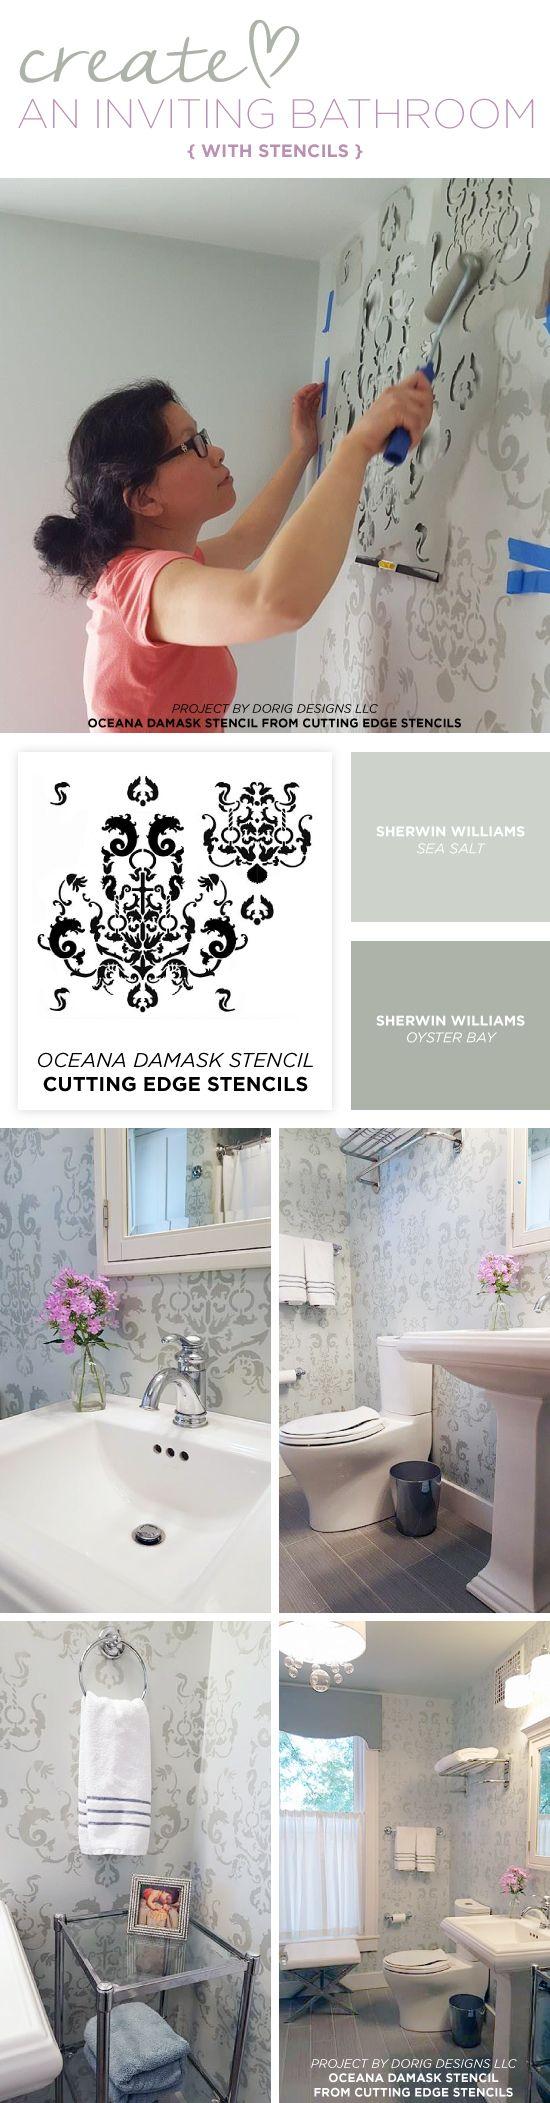 Cutting Edge Stencils shares a DIY bathroom makeover using the Oceana Damask wall pattern for a wallpaper look. http://www.cuttingedgestencils.com/stencil-nautical-decor.html